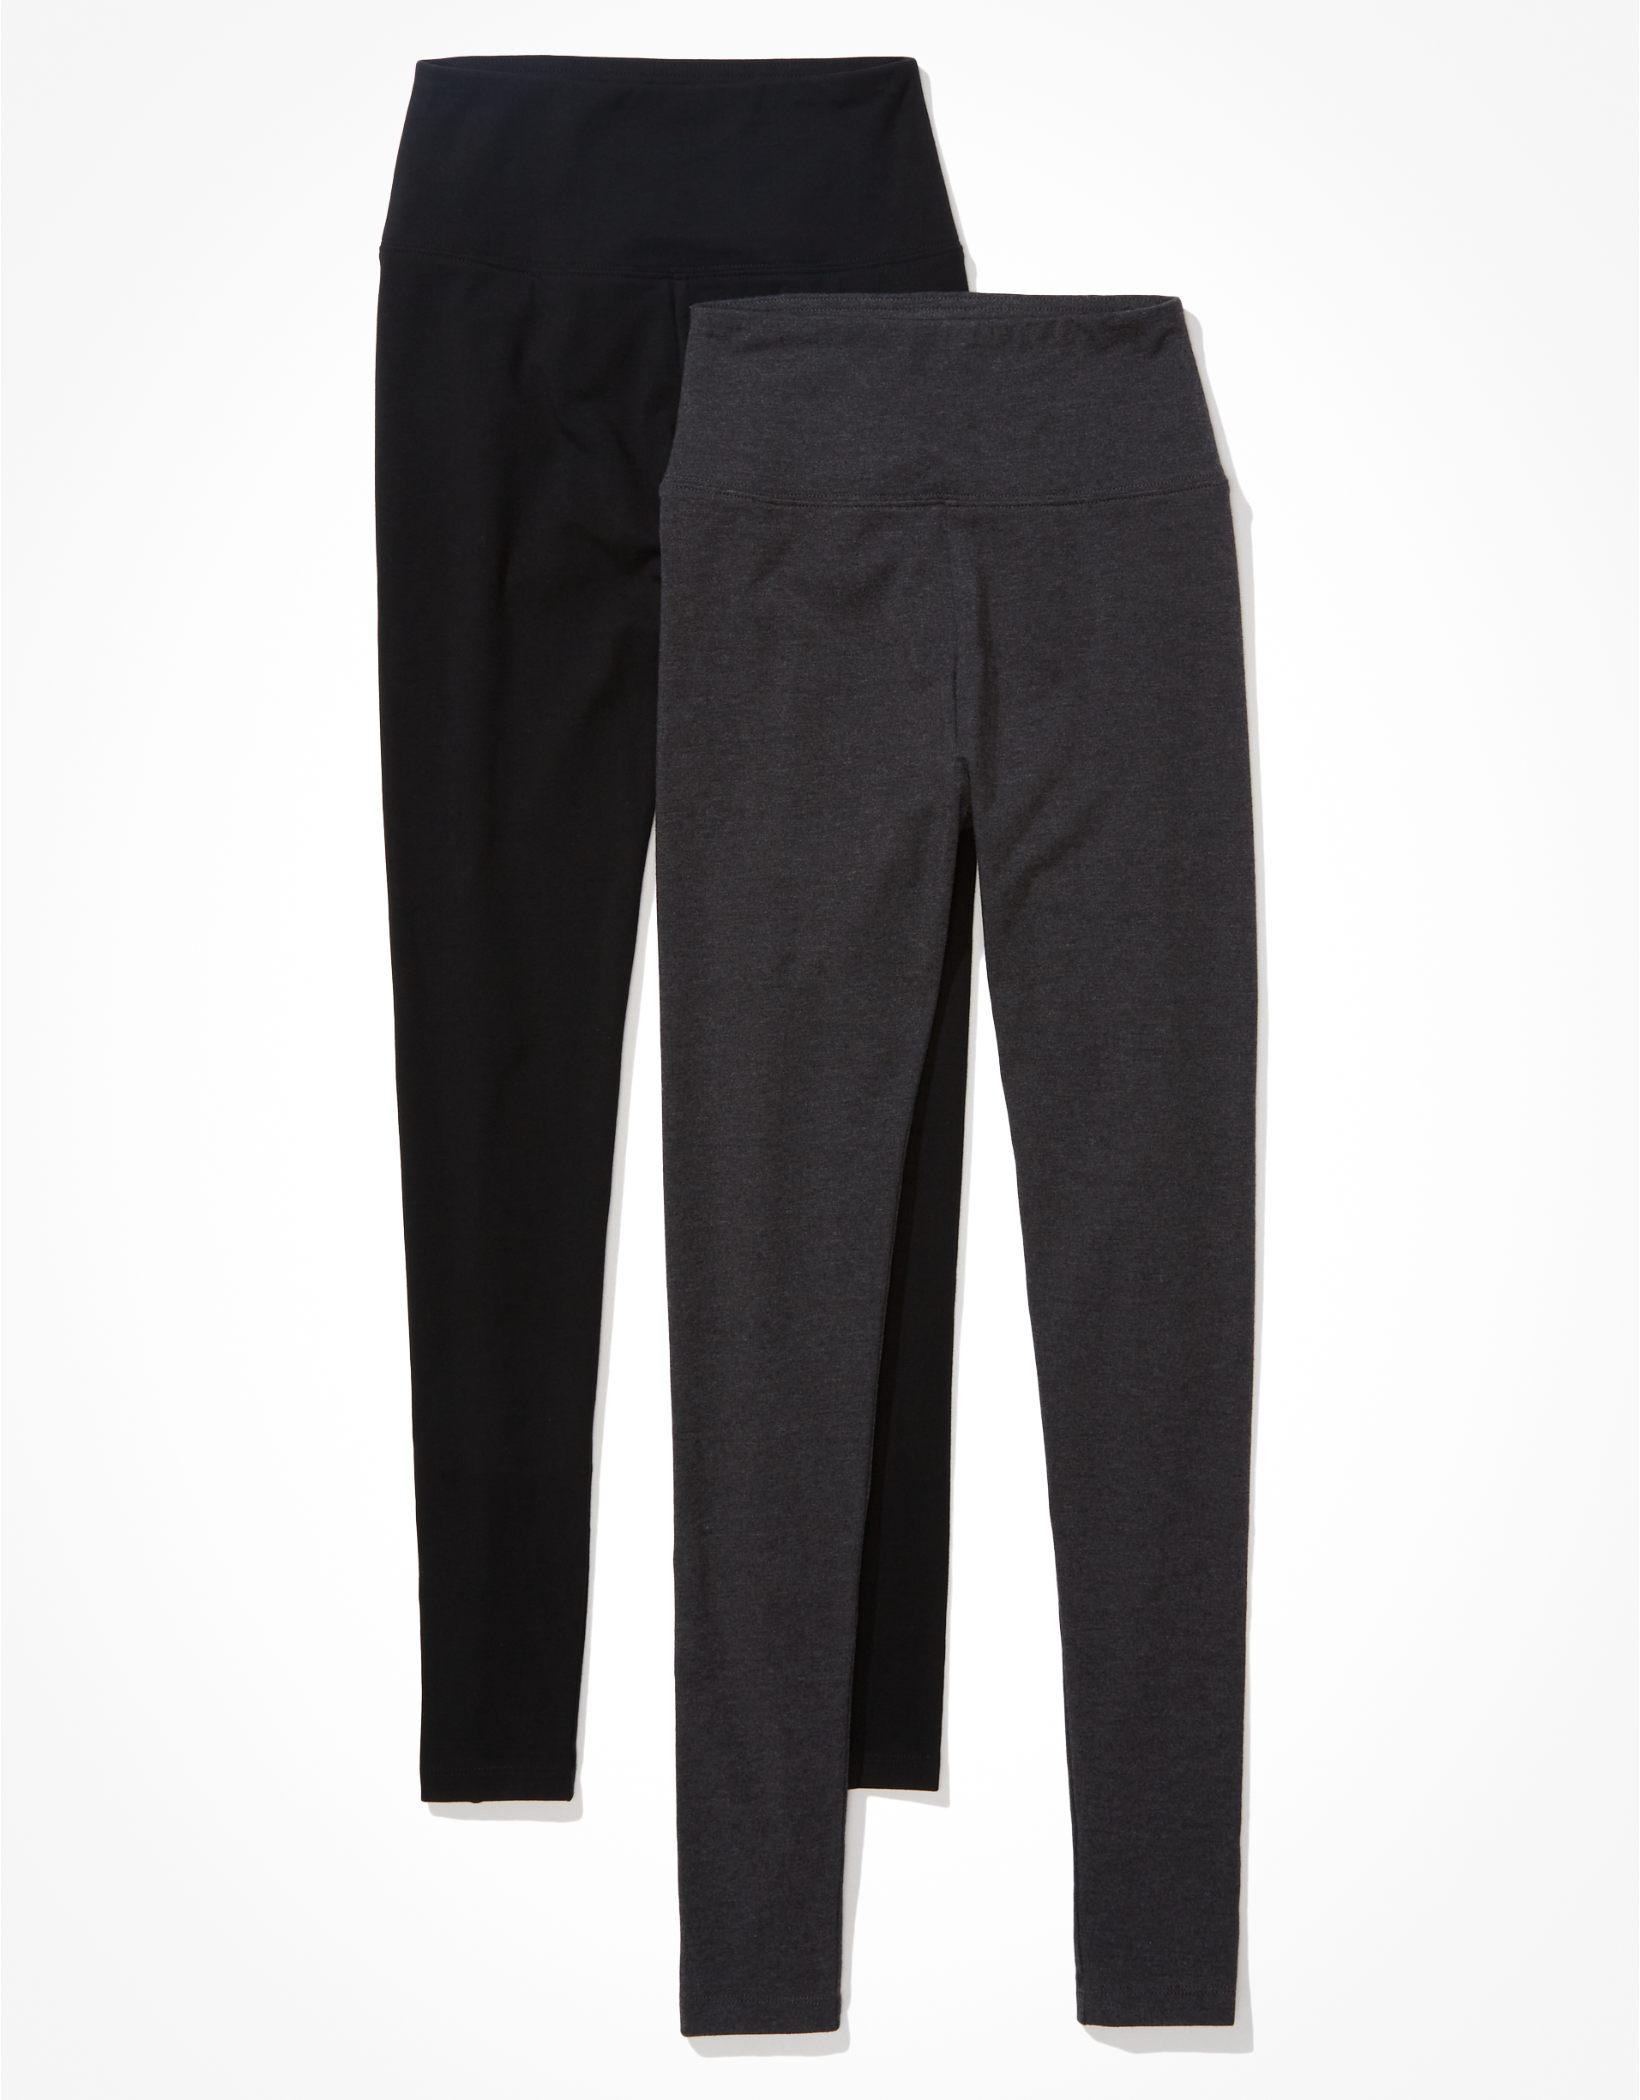 AE Cotton Blend Legging 2 Pack